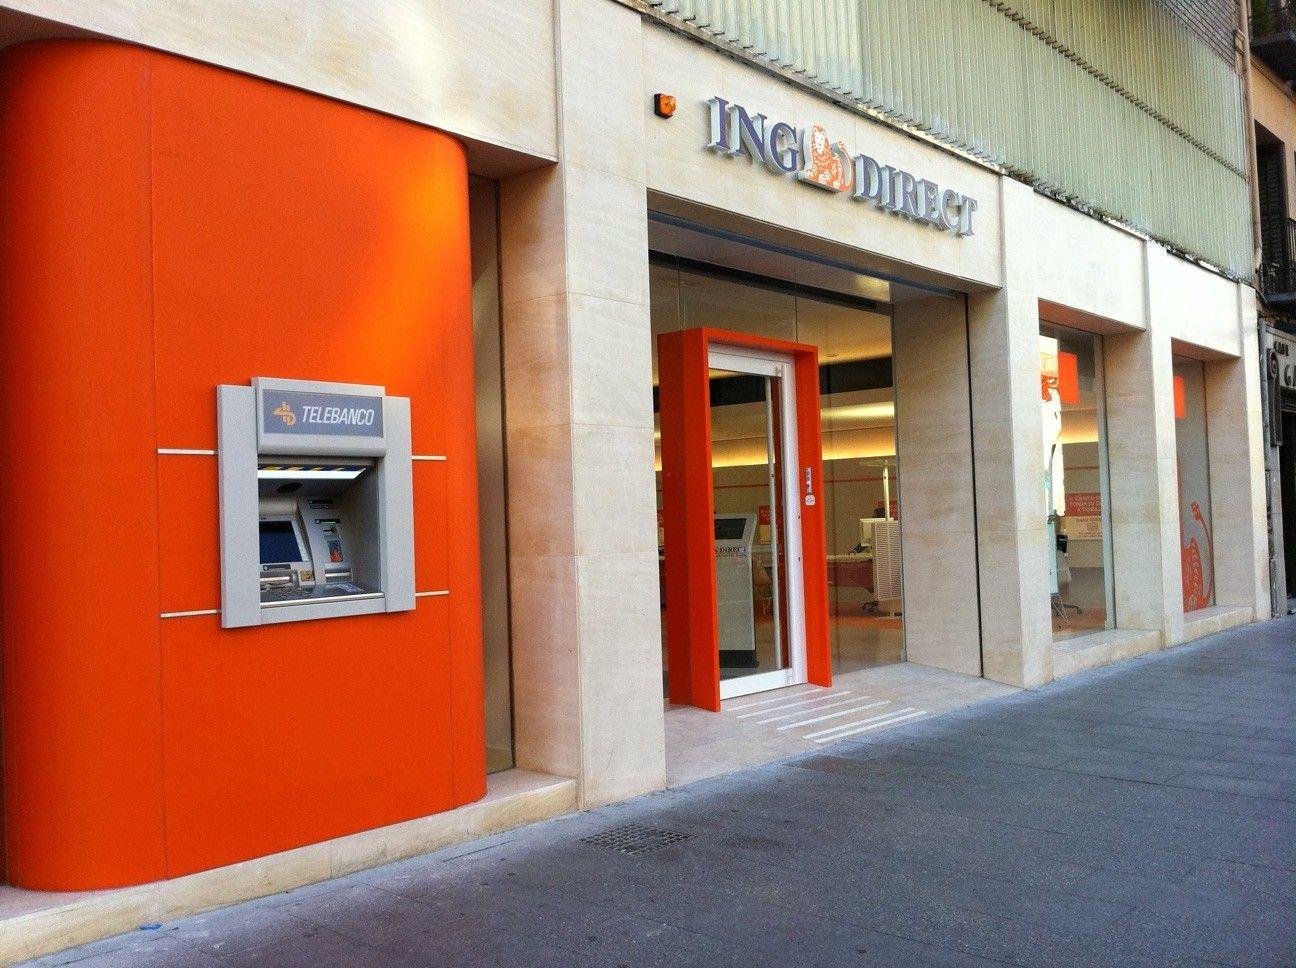 Calle costo 24 zaragoza espa a estilo pinterest for Oficinas mrw zaragoza